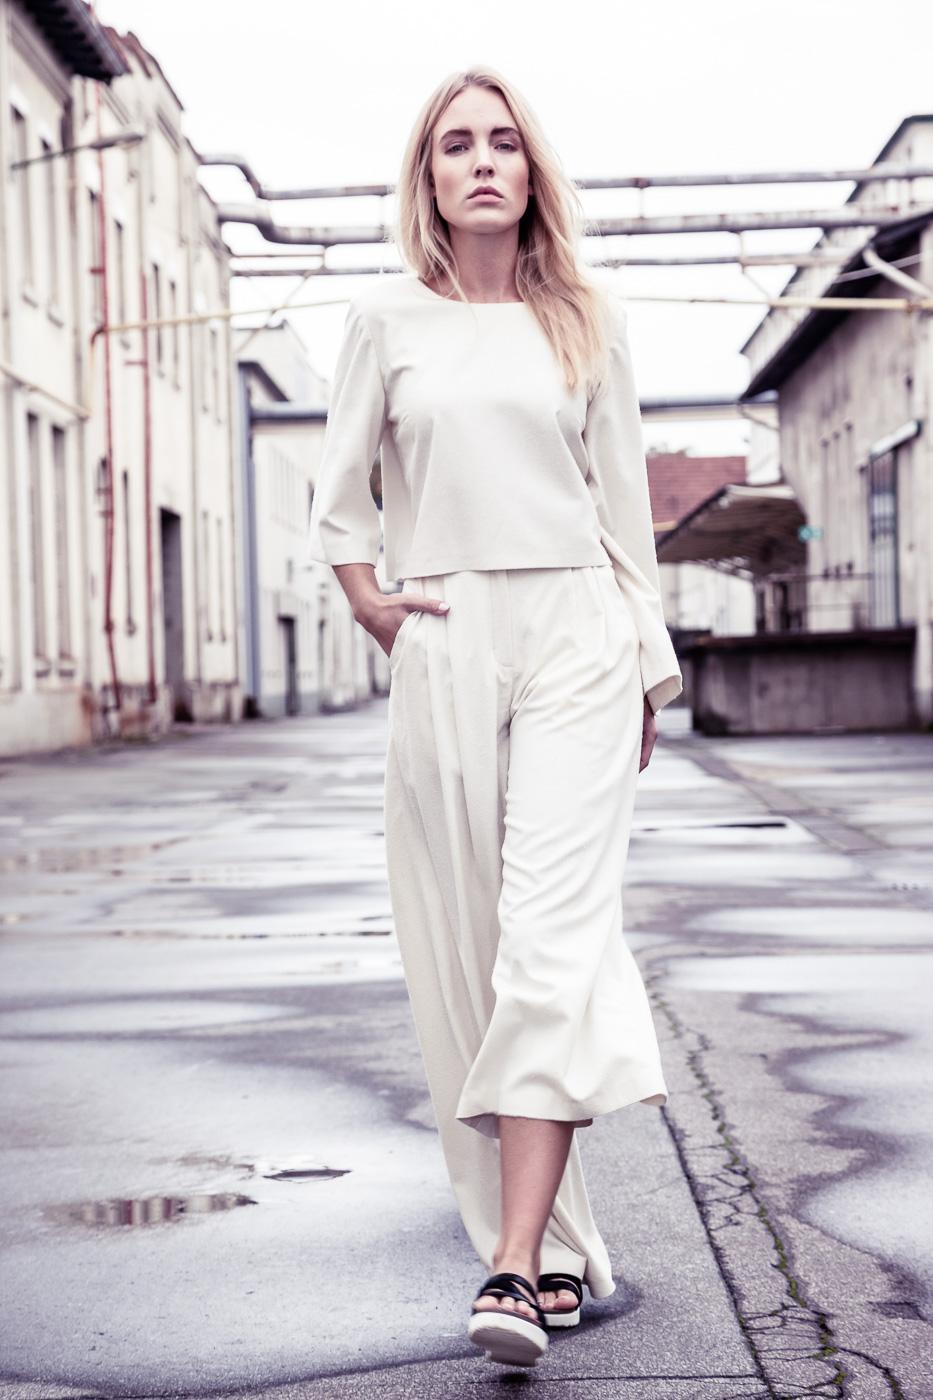 Lookbook Lena Hasibether Spring/Summer 2016 Bielefeld